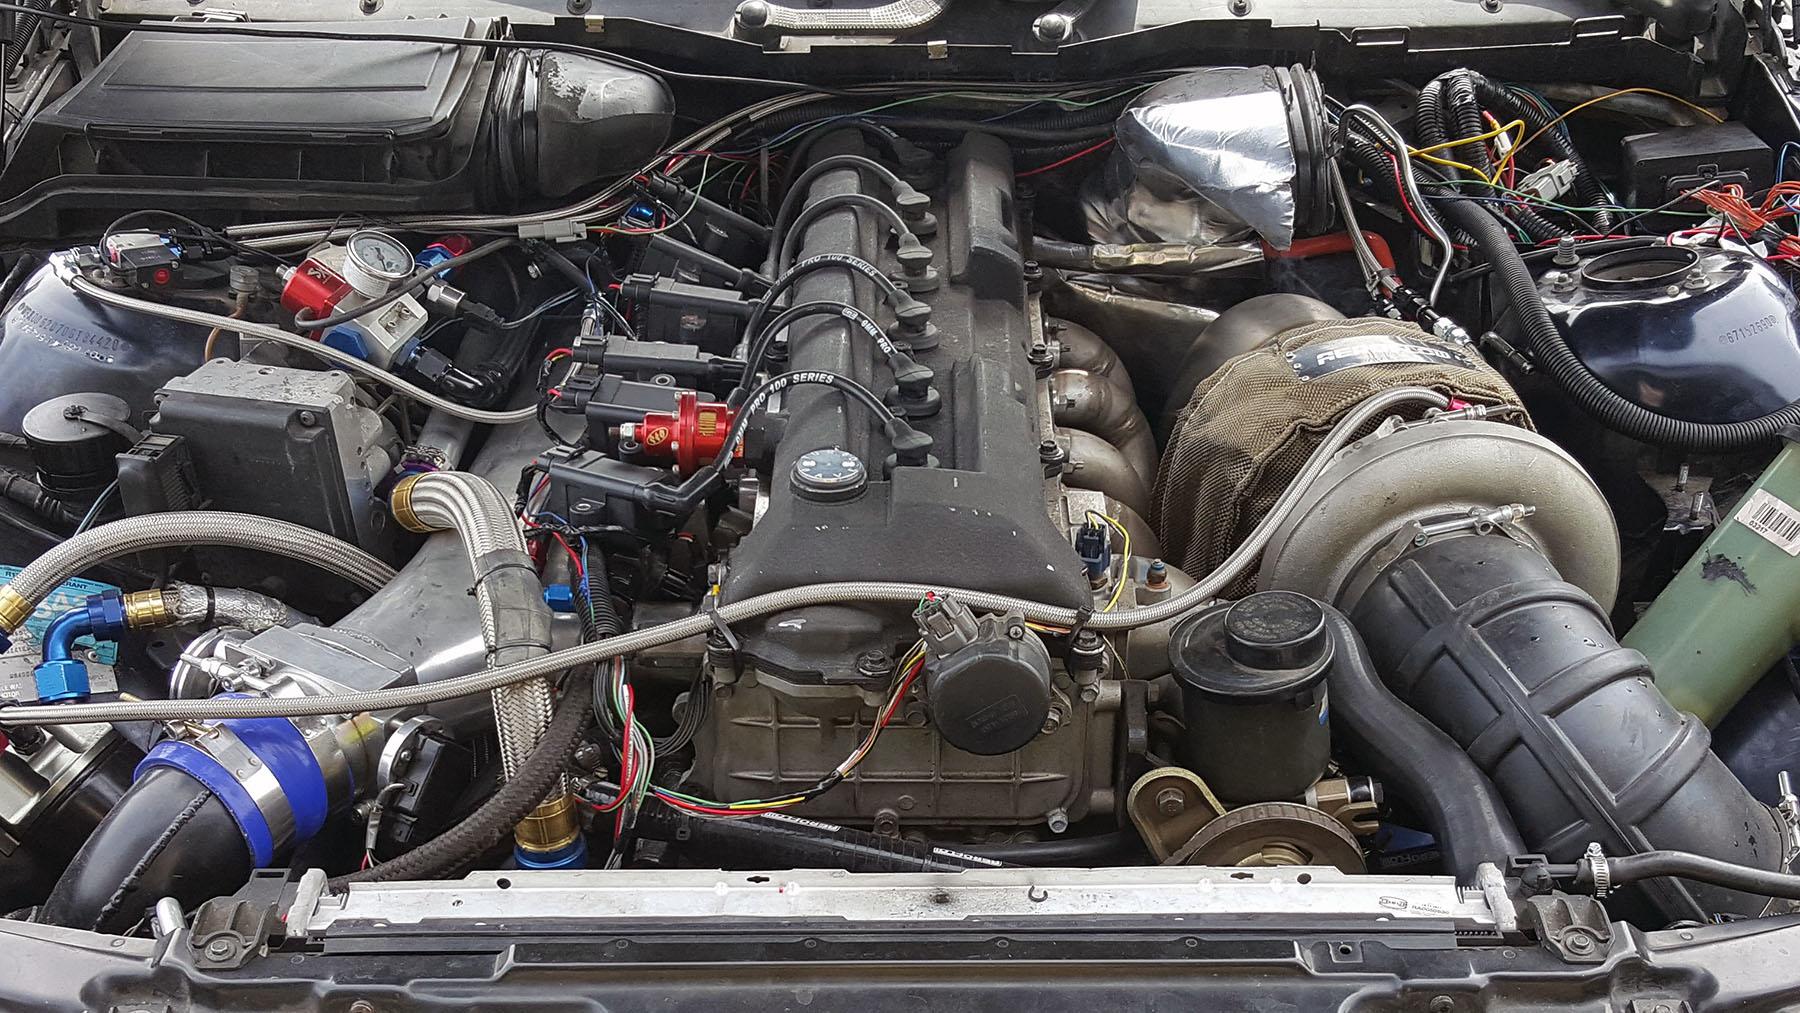 Bmw E With A Turbo L Tb Inline Six on Zf Transmission Website